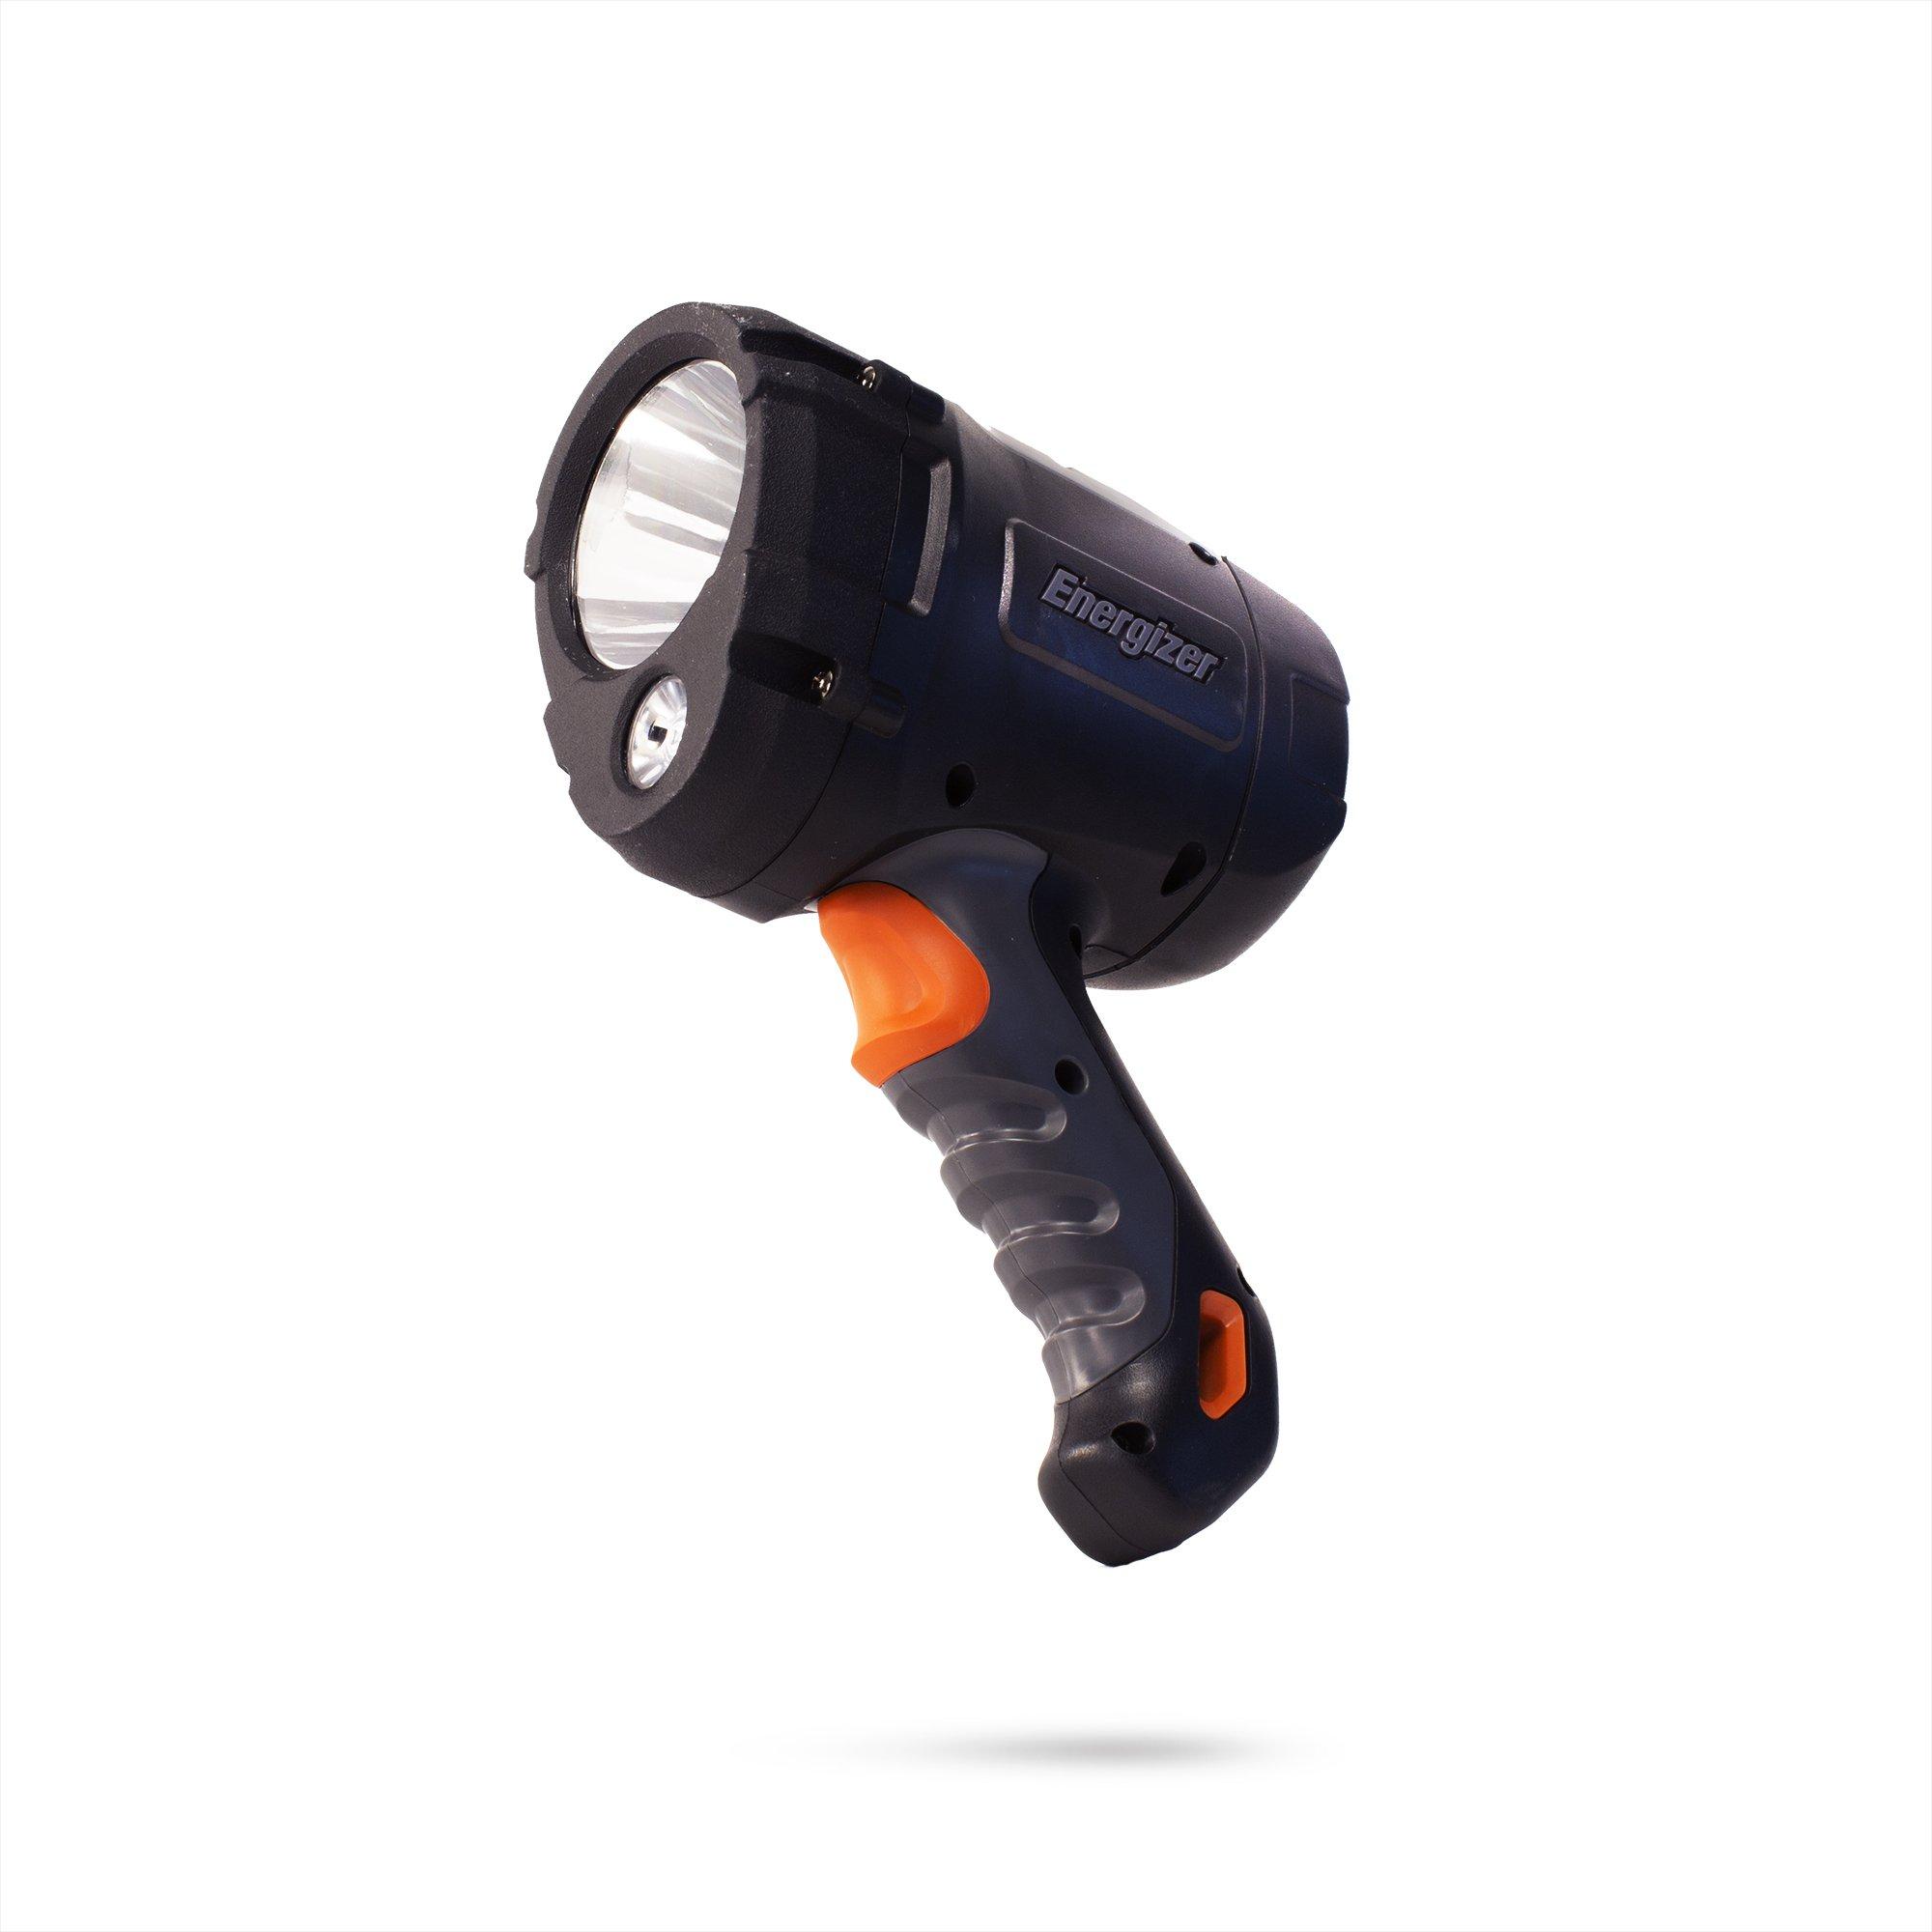 Energizer Hard Case Professional Spotlight by Energizer (Image #1)